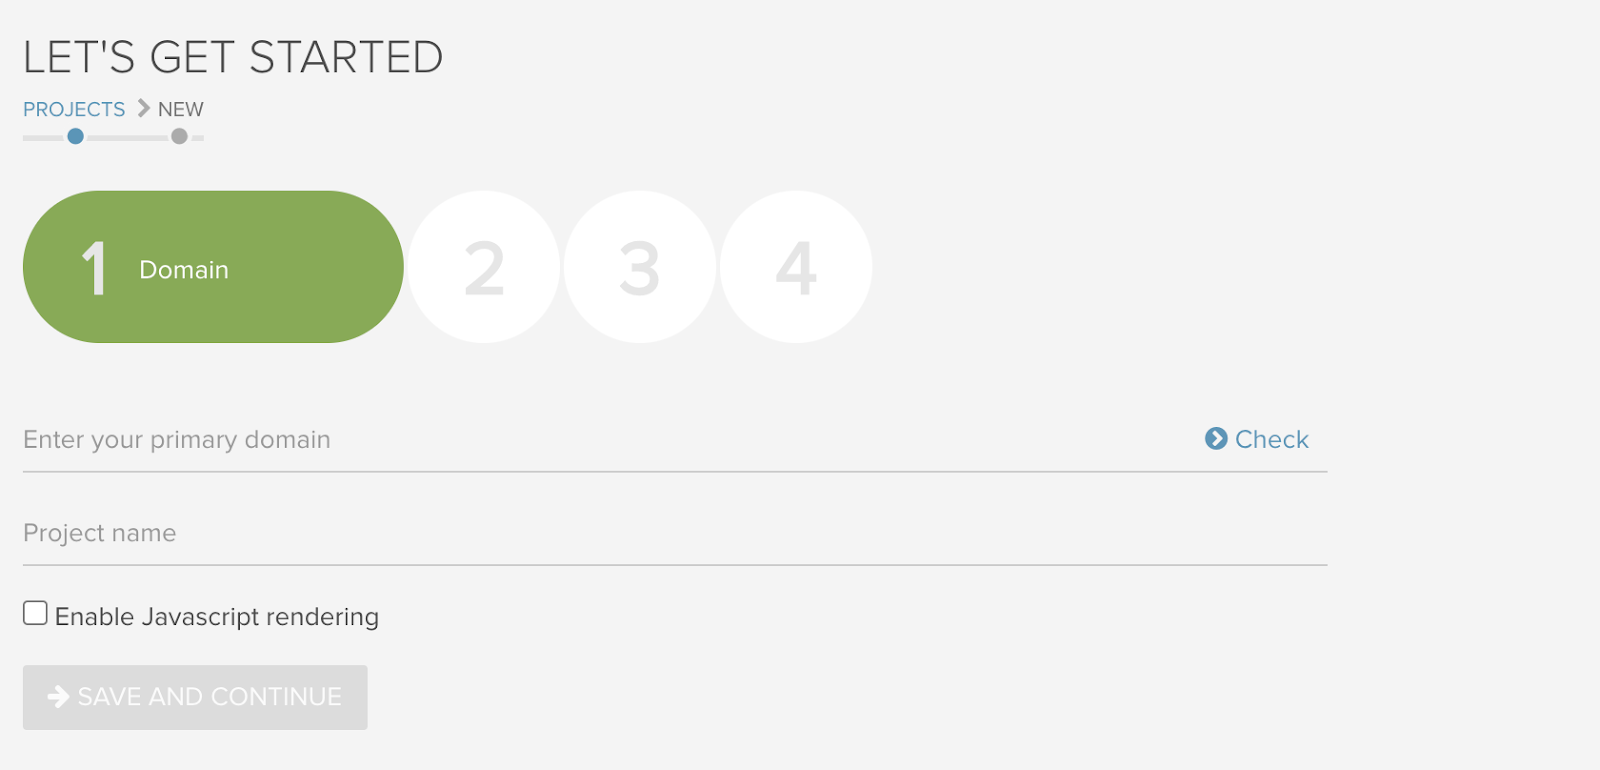 Deepcrawl app get started screen